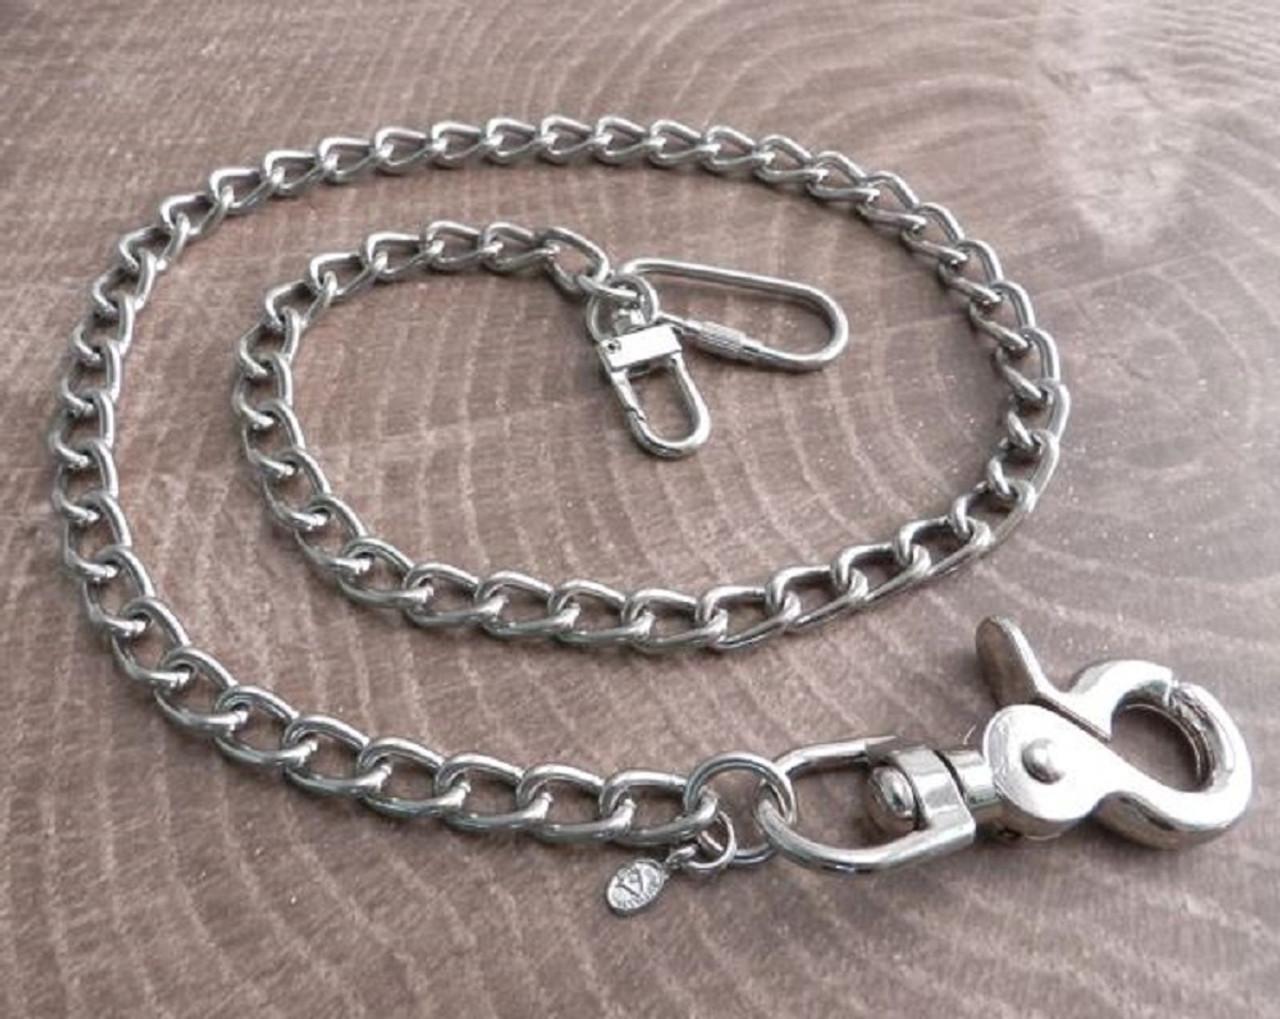 8ac9f3c900a Wallet Chain, Splicer 22